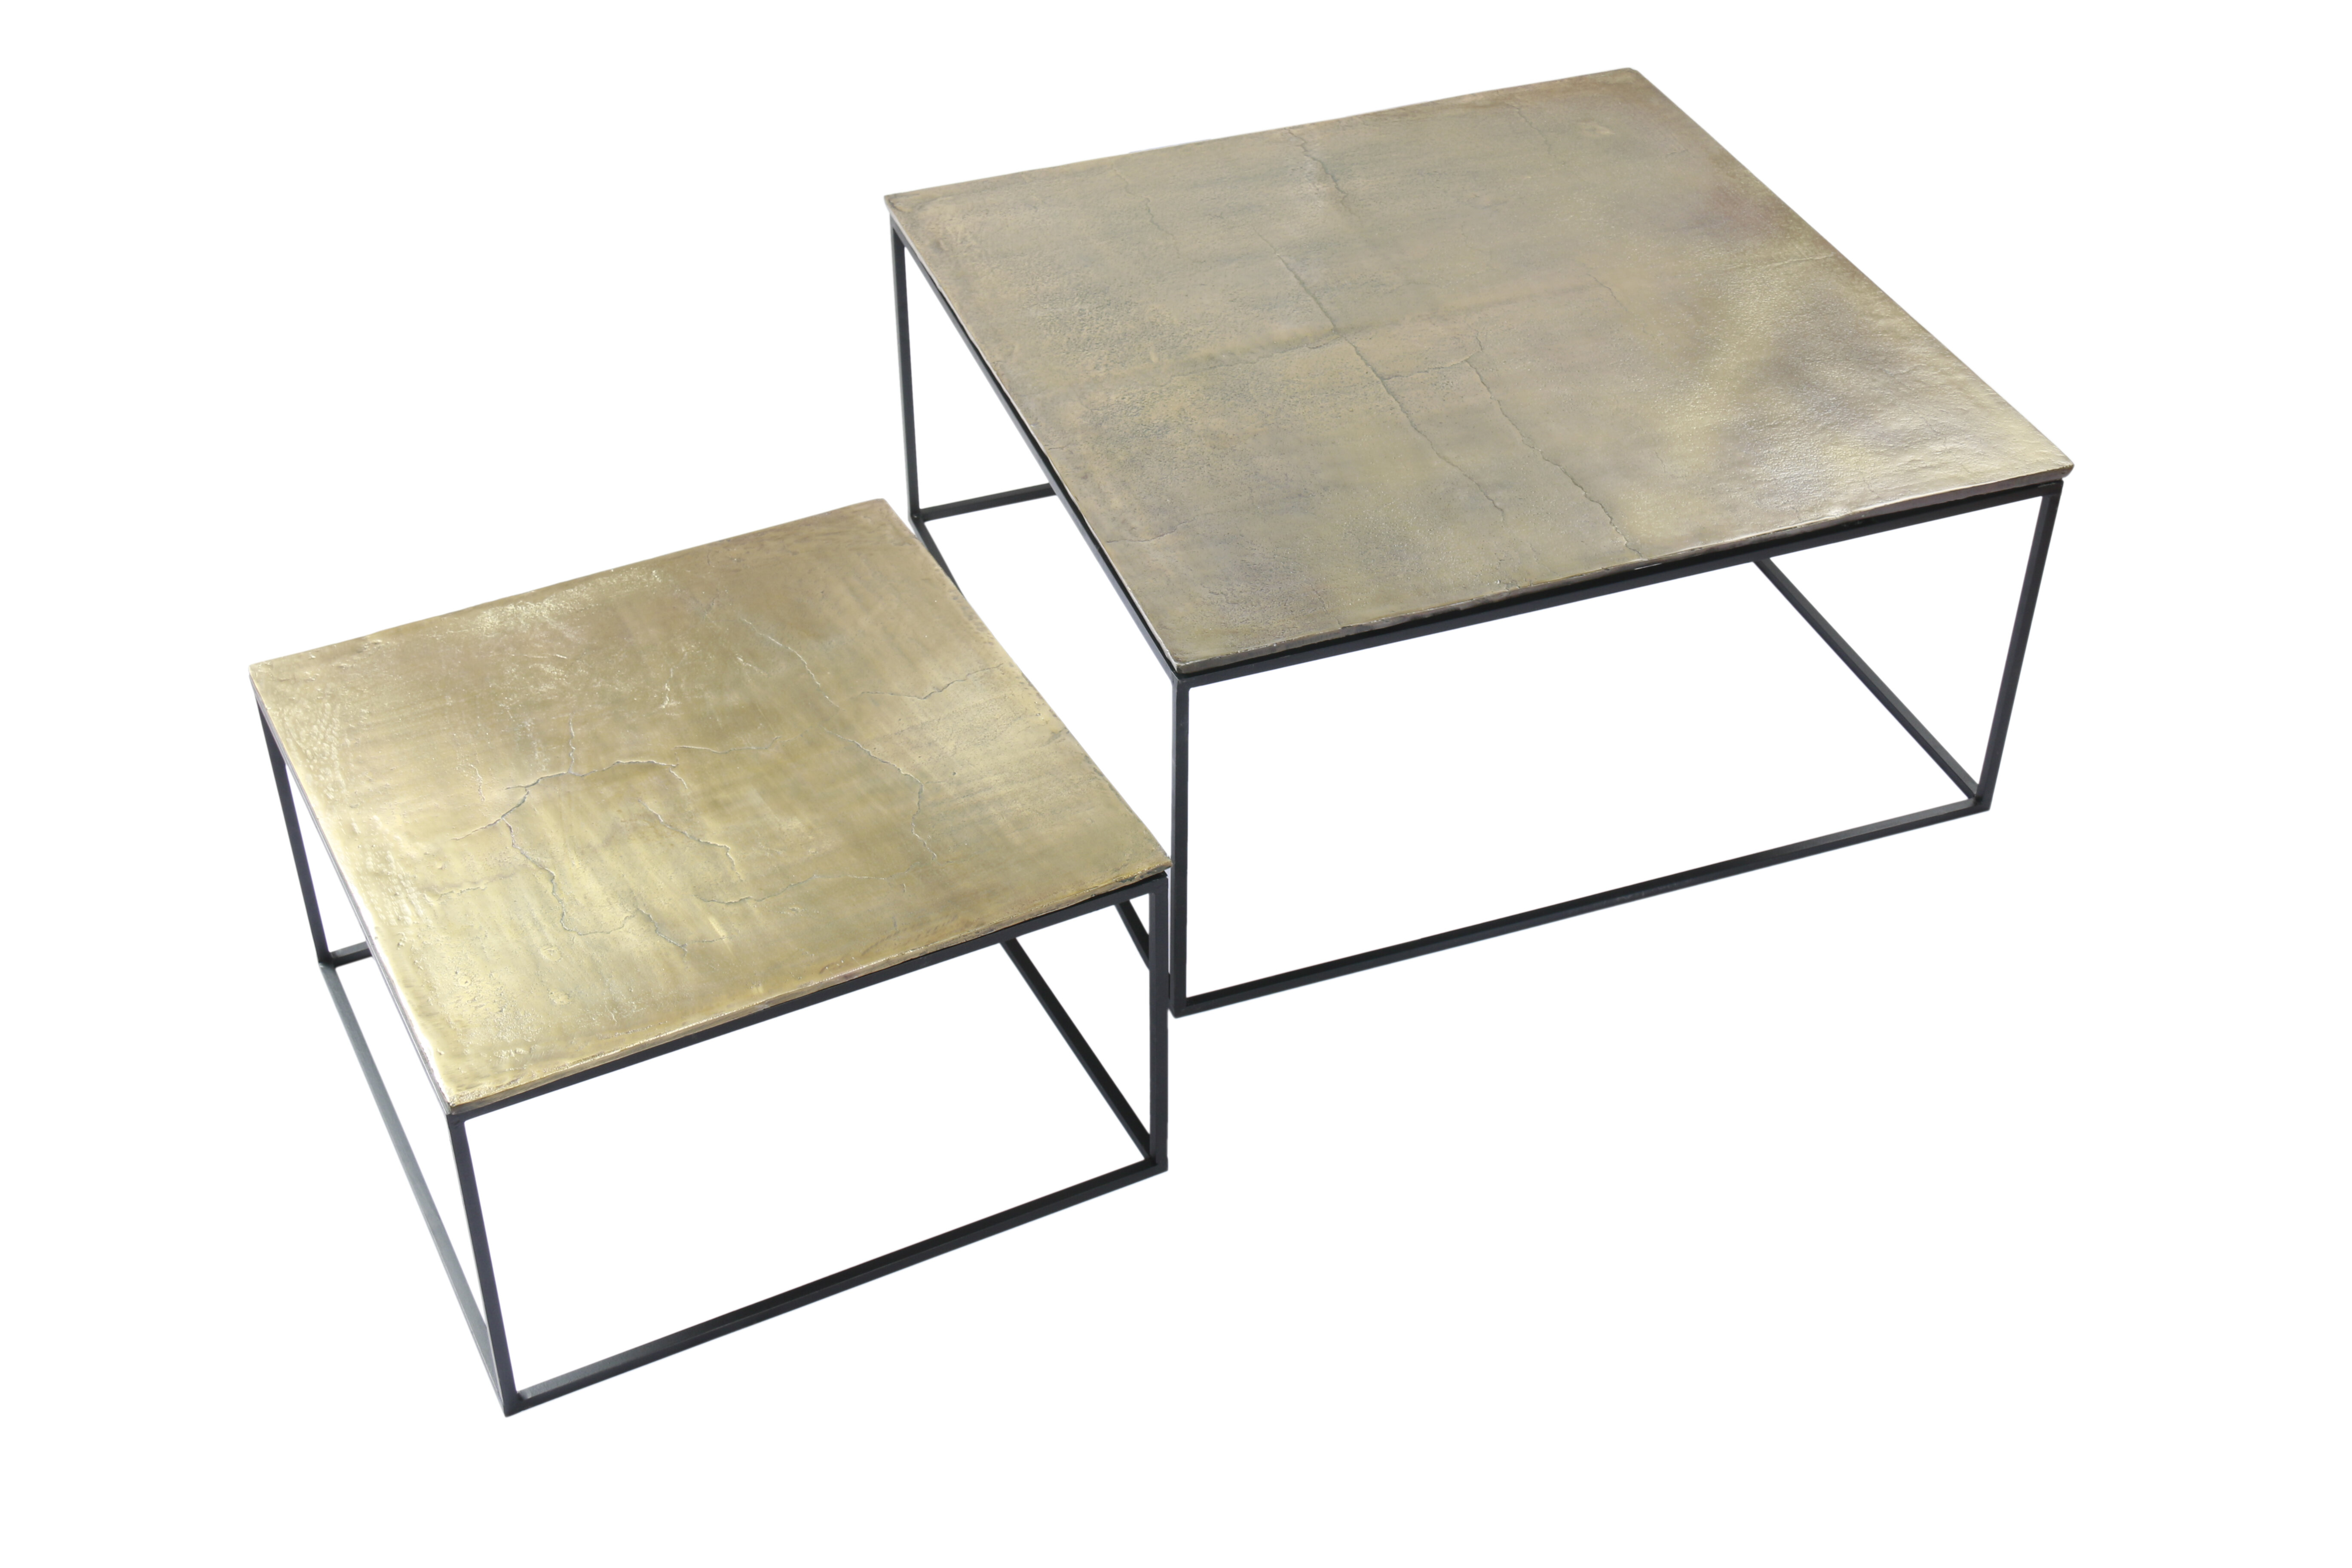 BIDKhome 2 Piece Coffee Table Set